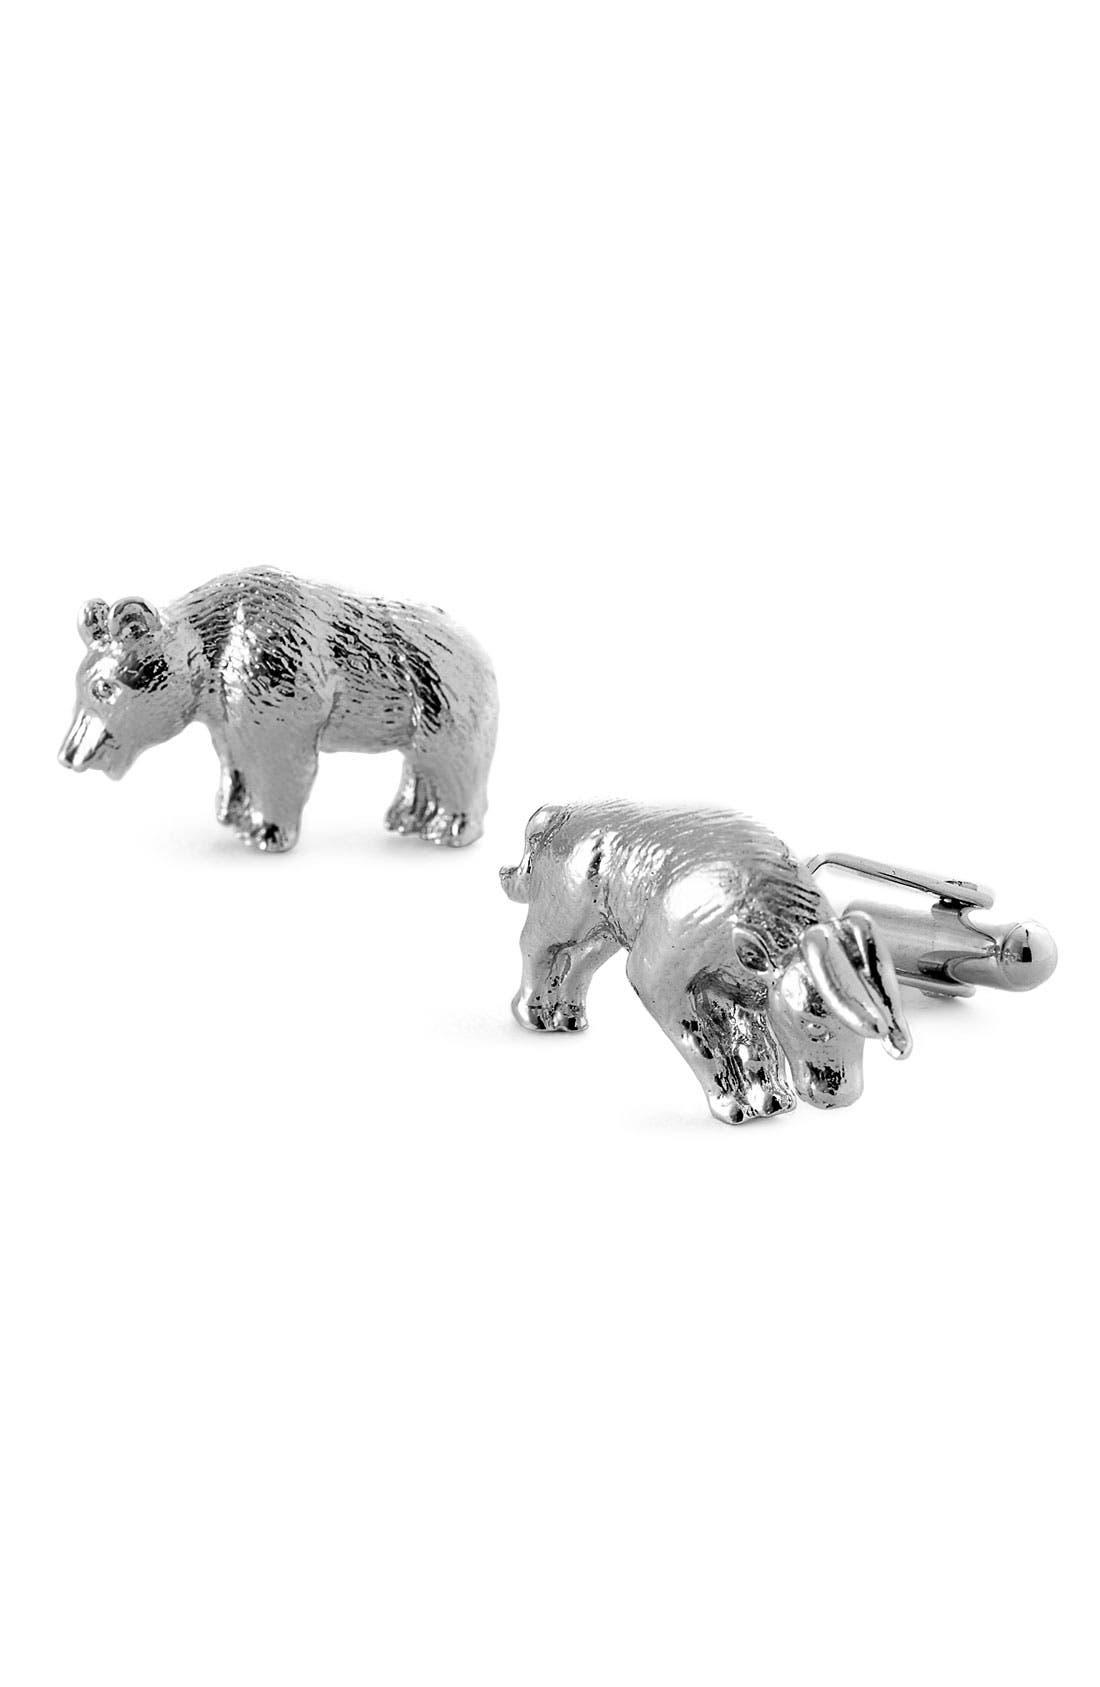 Alternate Image 1 Selected - David Donahue 'Bull & Bear' Cuff Links